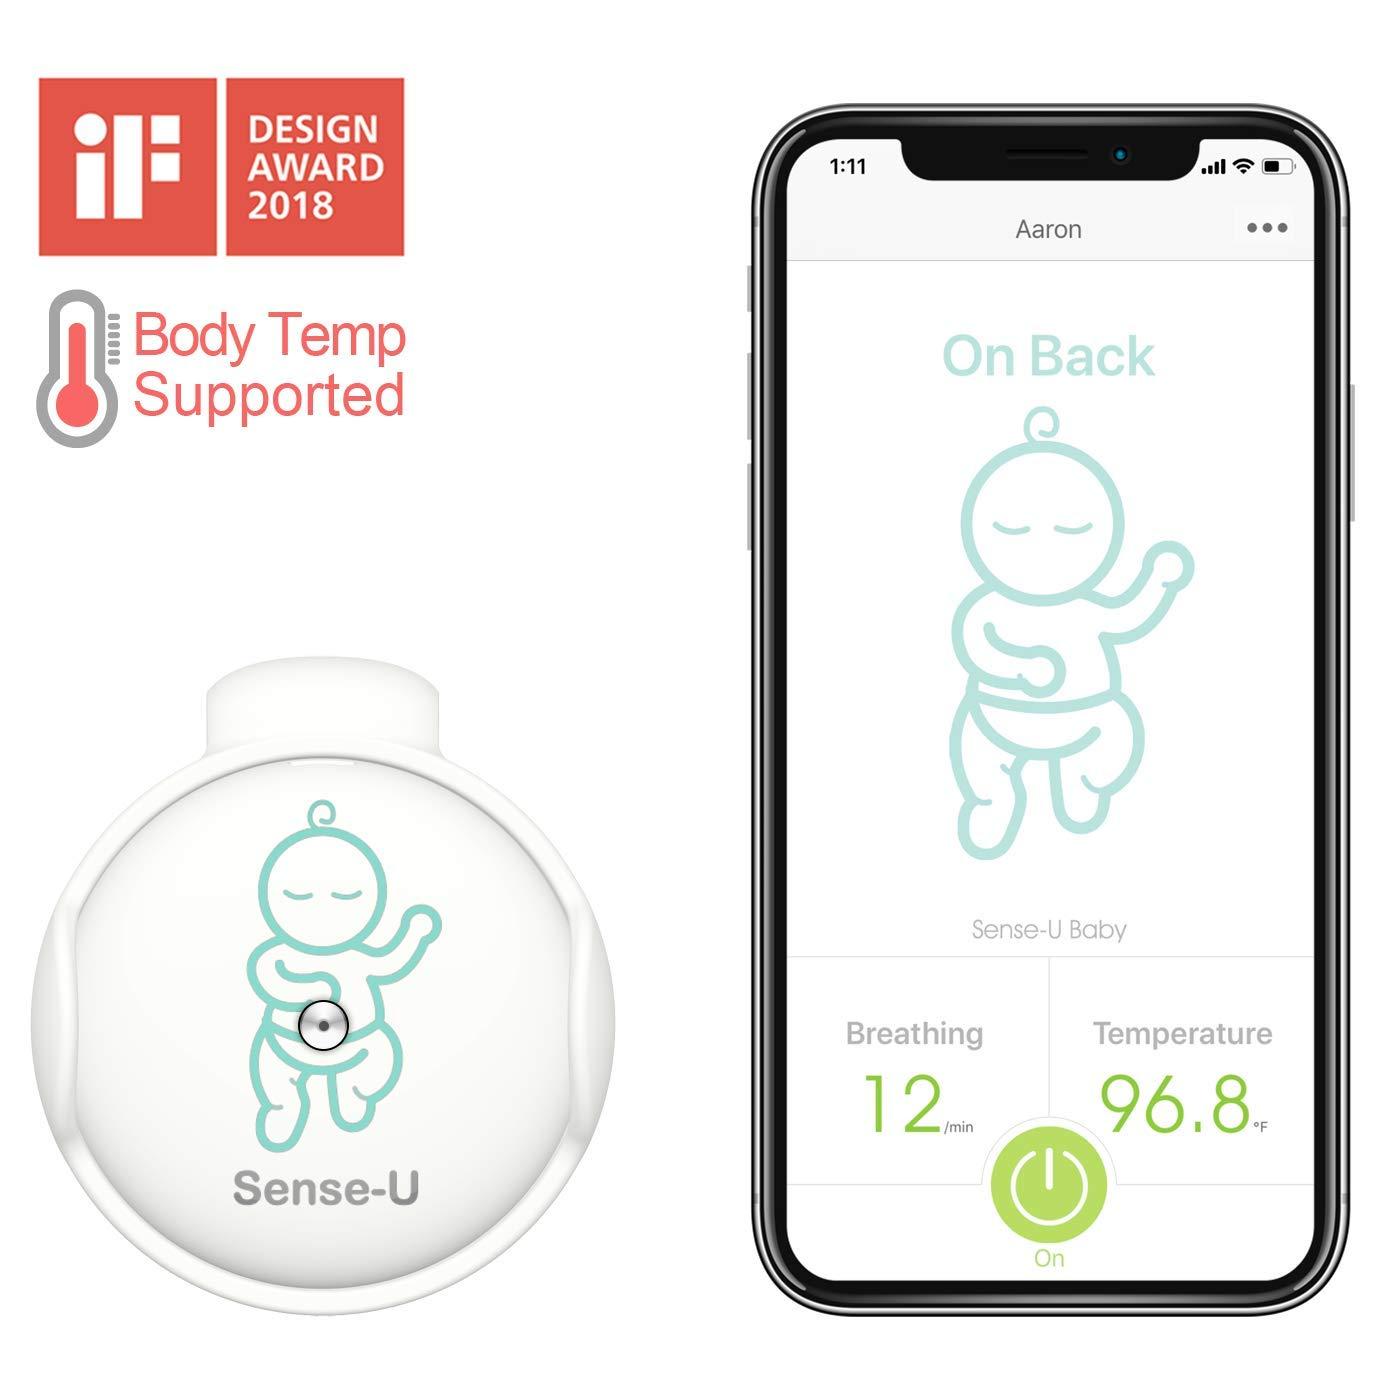 2020 New Model Sense-U Baby Monitor with Breathing Rollover Movement Body Temperature Sensors Track Your Baby s Breathing, Rollover, Body Temperature with New Clasp Design Body Temperature